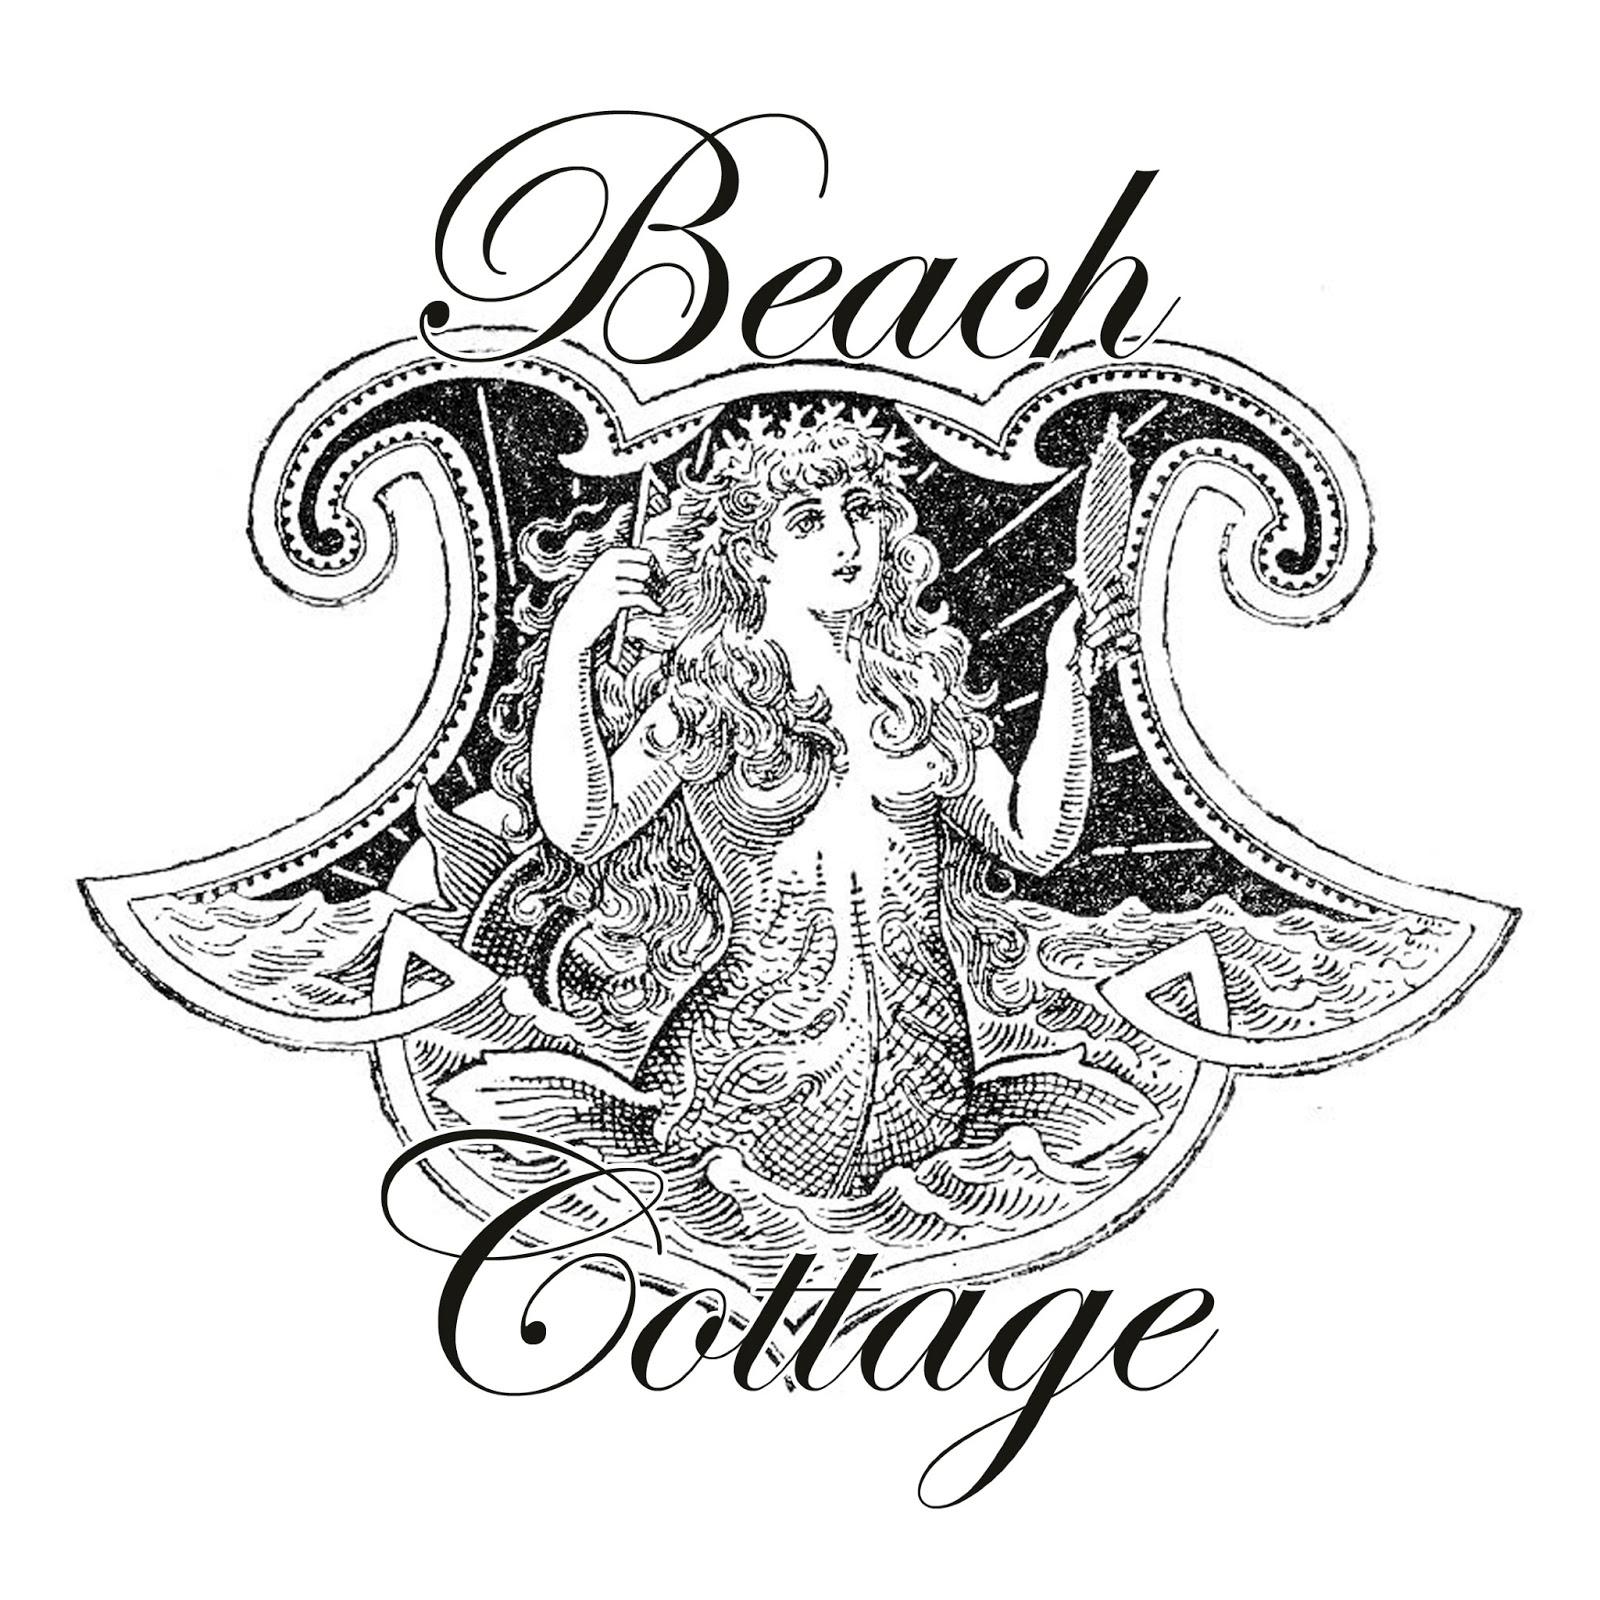 Vintage beach clipart jpg freeuse stock Free Vintage Beach Cliparts, Download Free Clip Art, Free ... jpg freeuse stock